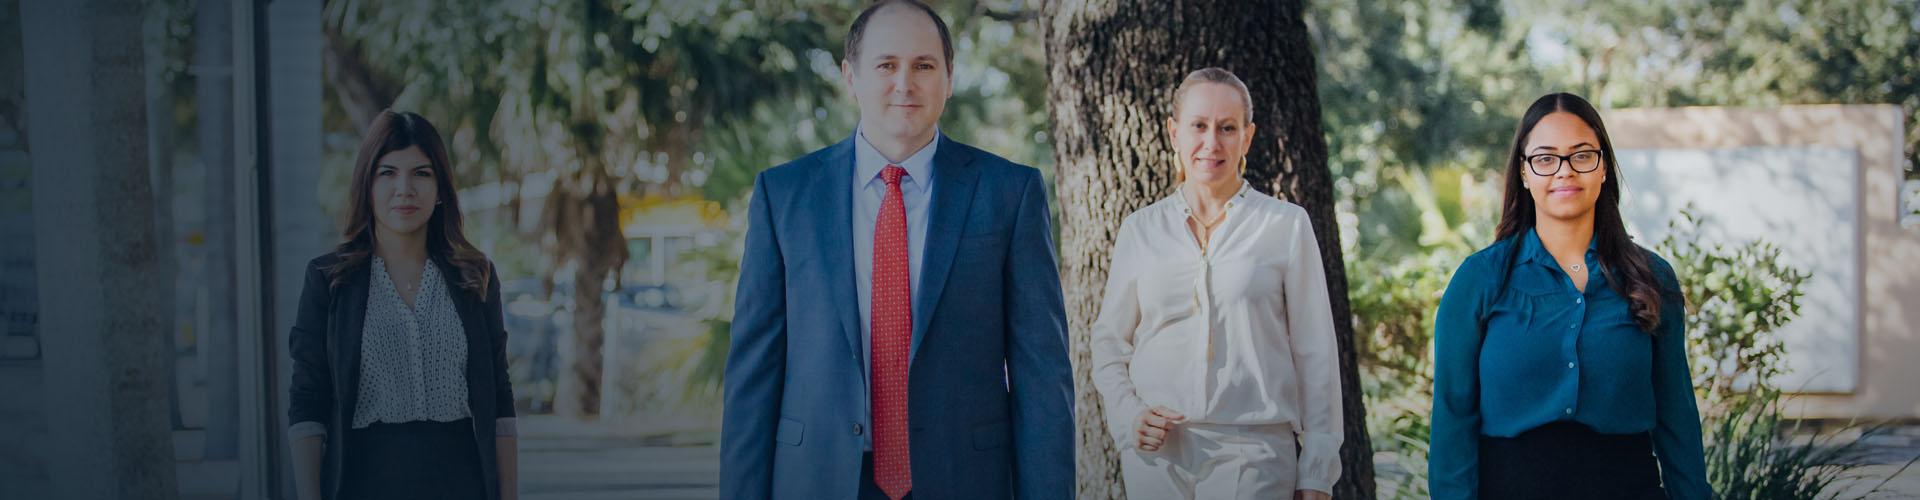 Florida Loan Modification Attorneys - Stiberman Law Firm